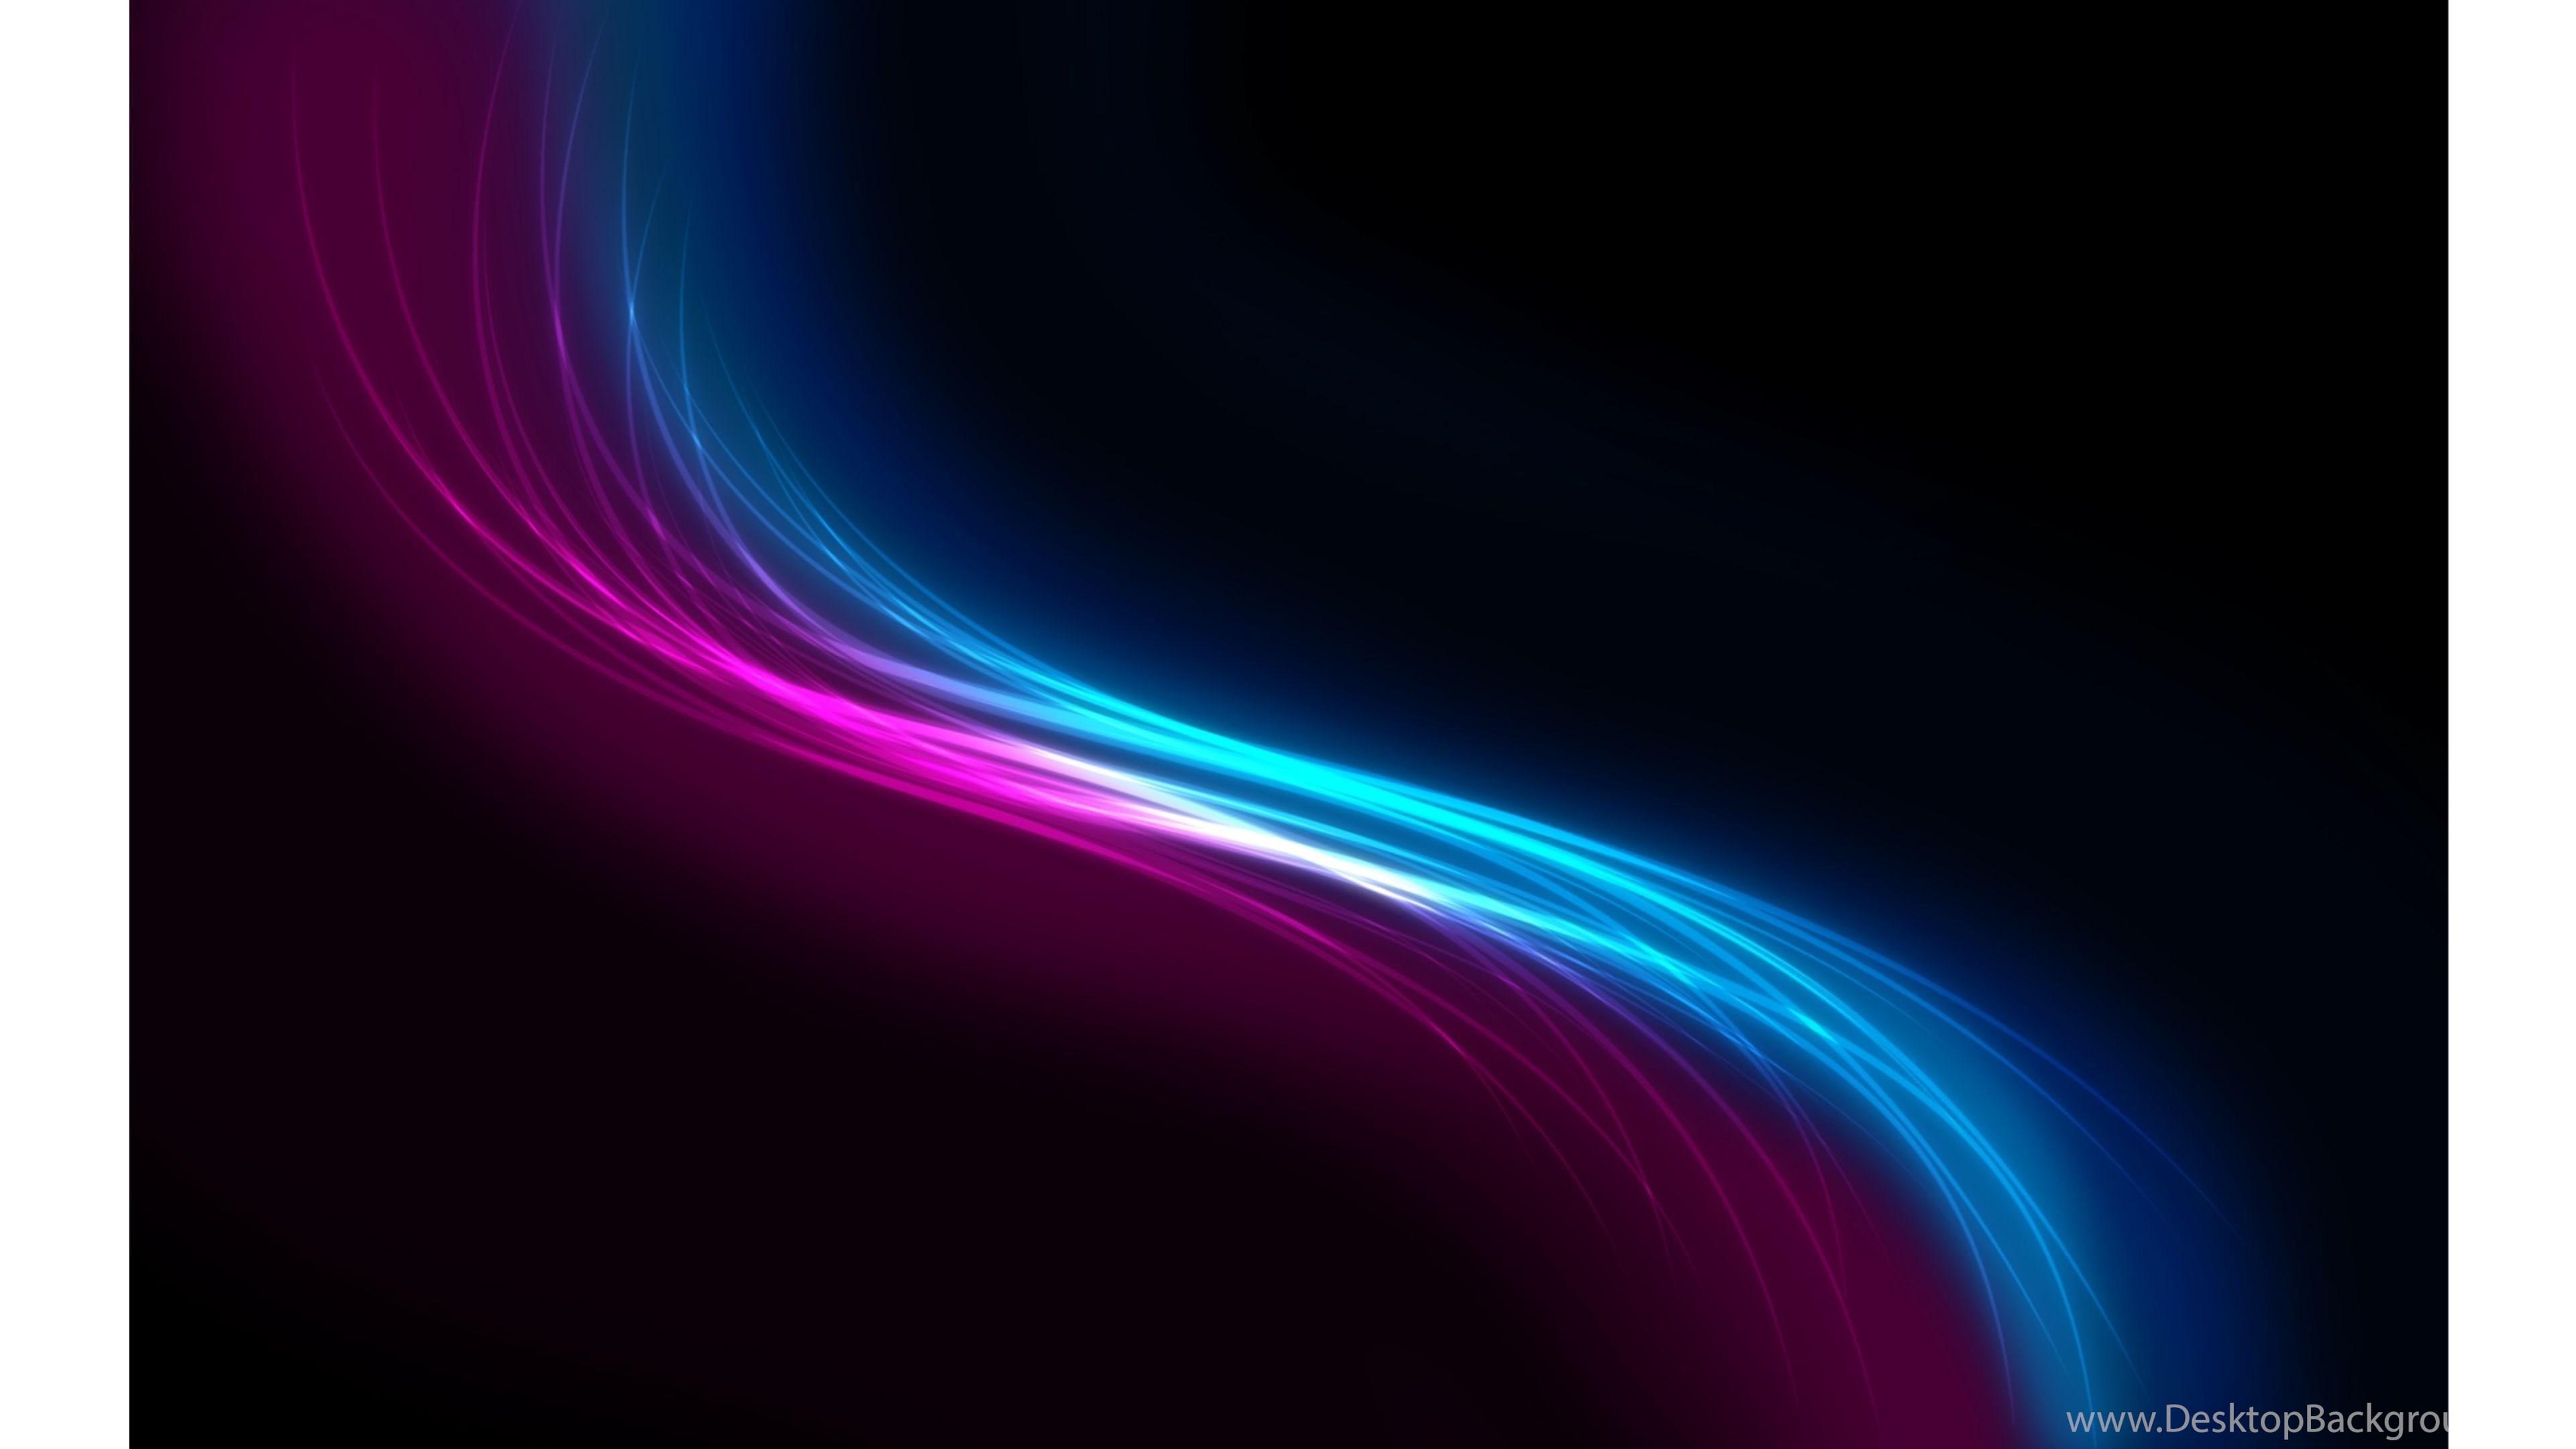 Ipad Mini Wallpaper Hd Wave 4k Abstract Wallpapers Desktop Background